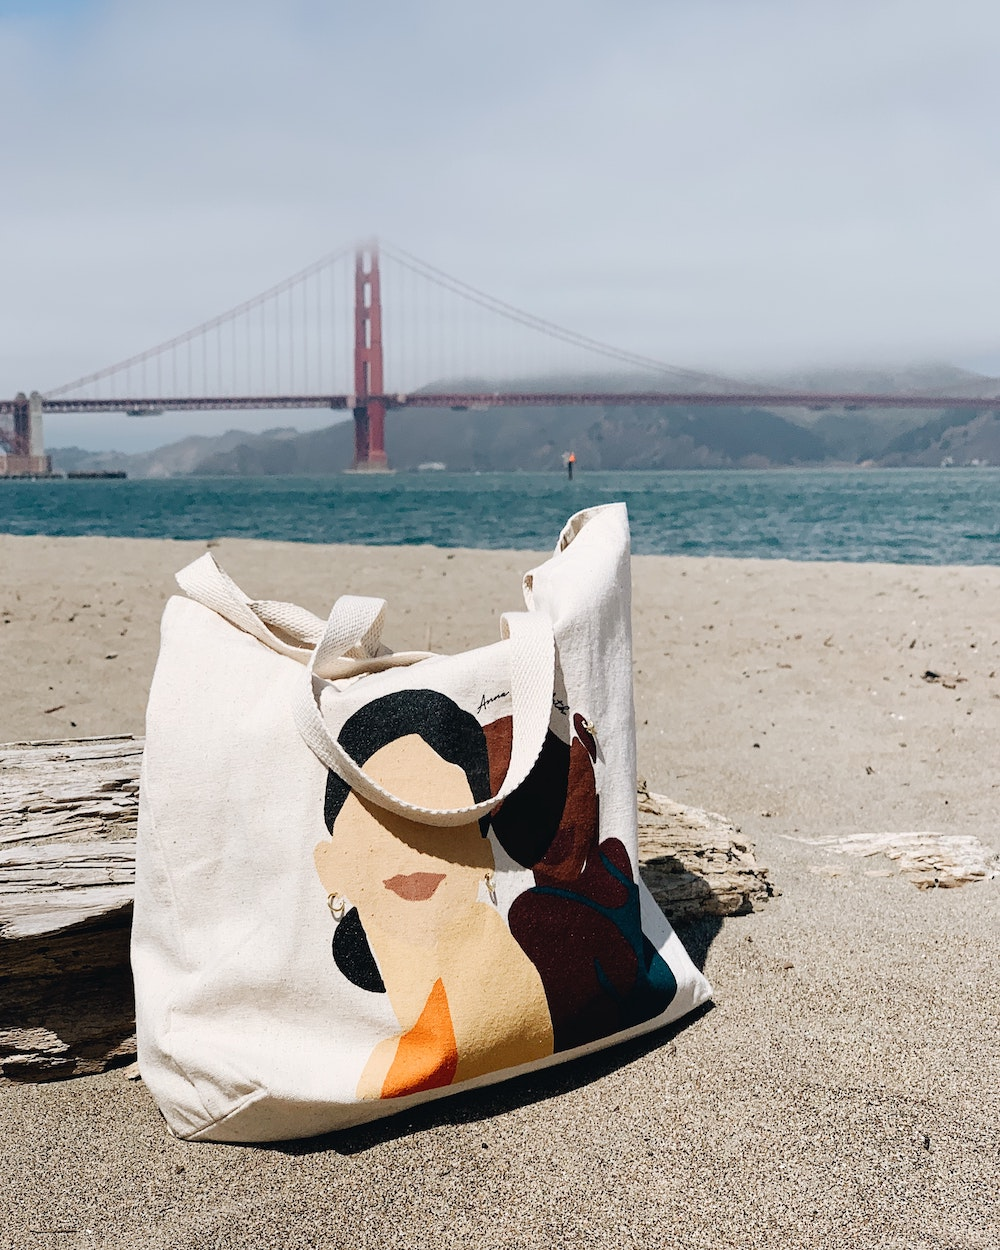 reusable tote bag for travel at golden gate bridge in san francisco